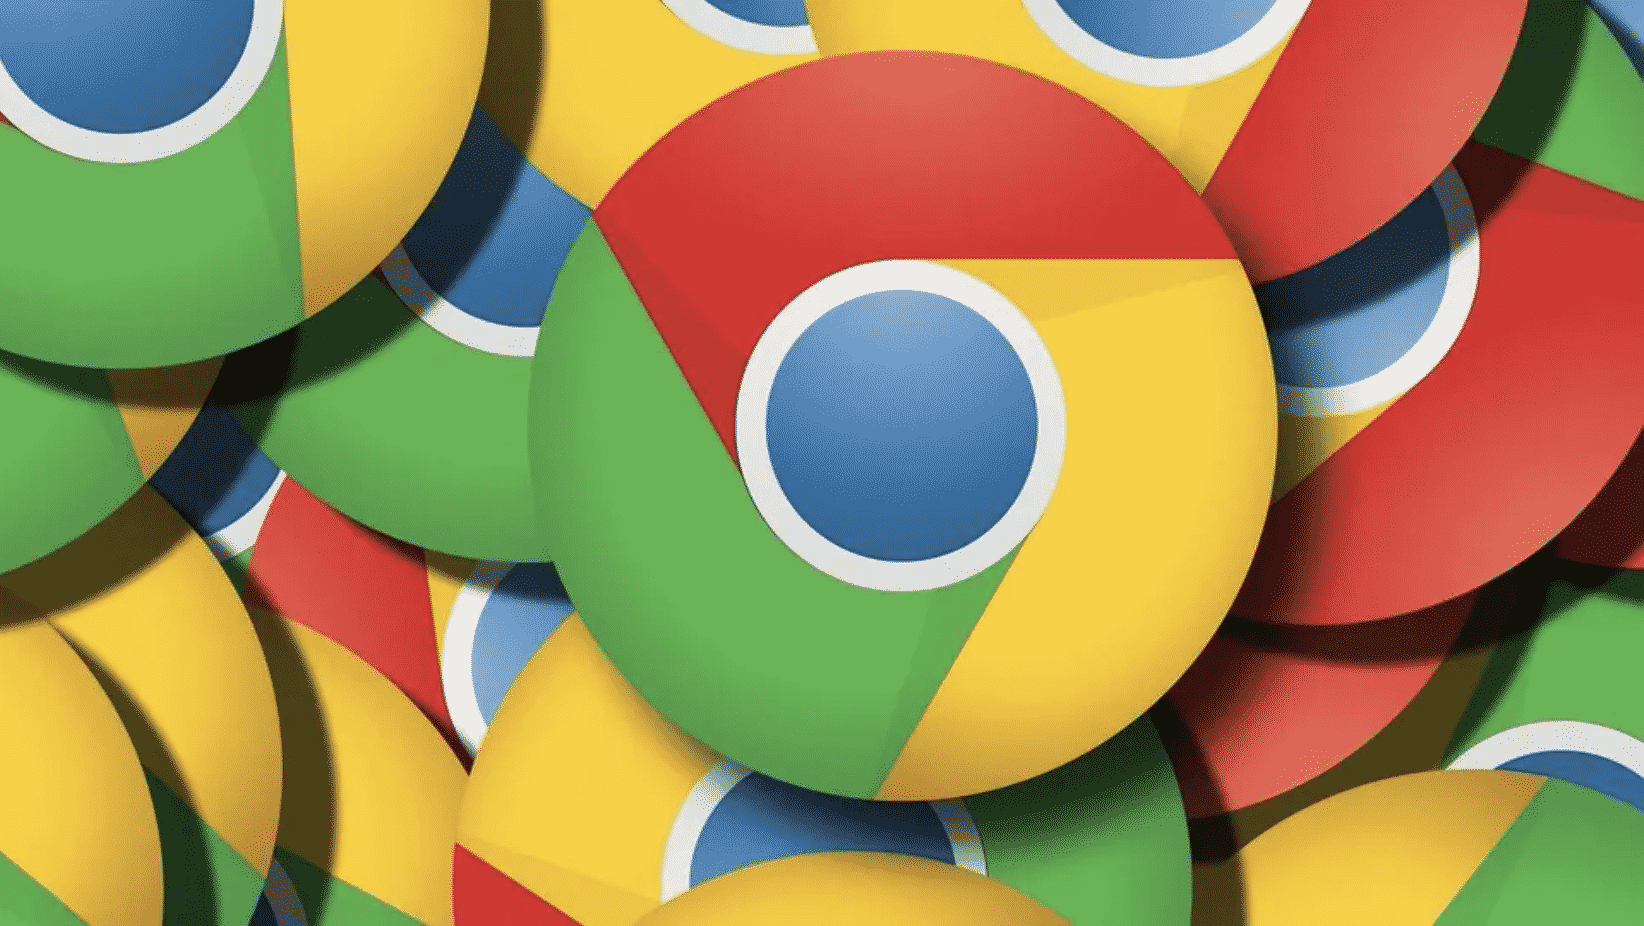 Google fights off Zero-day vulnerability in new Chrome update